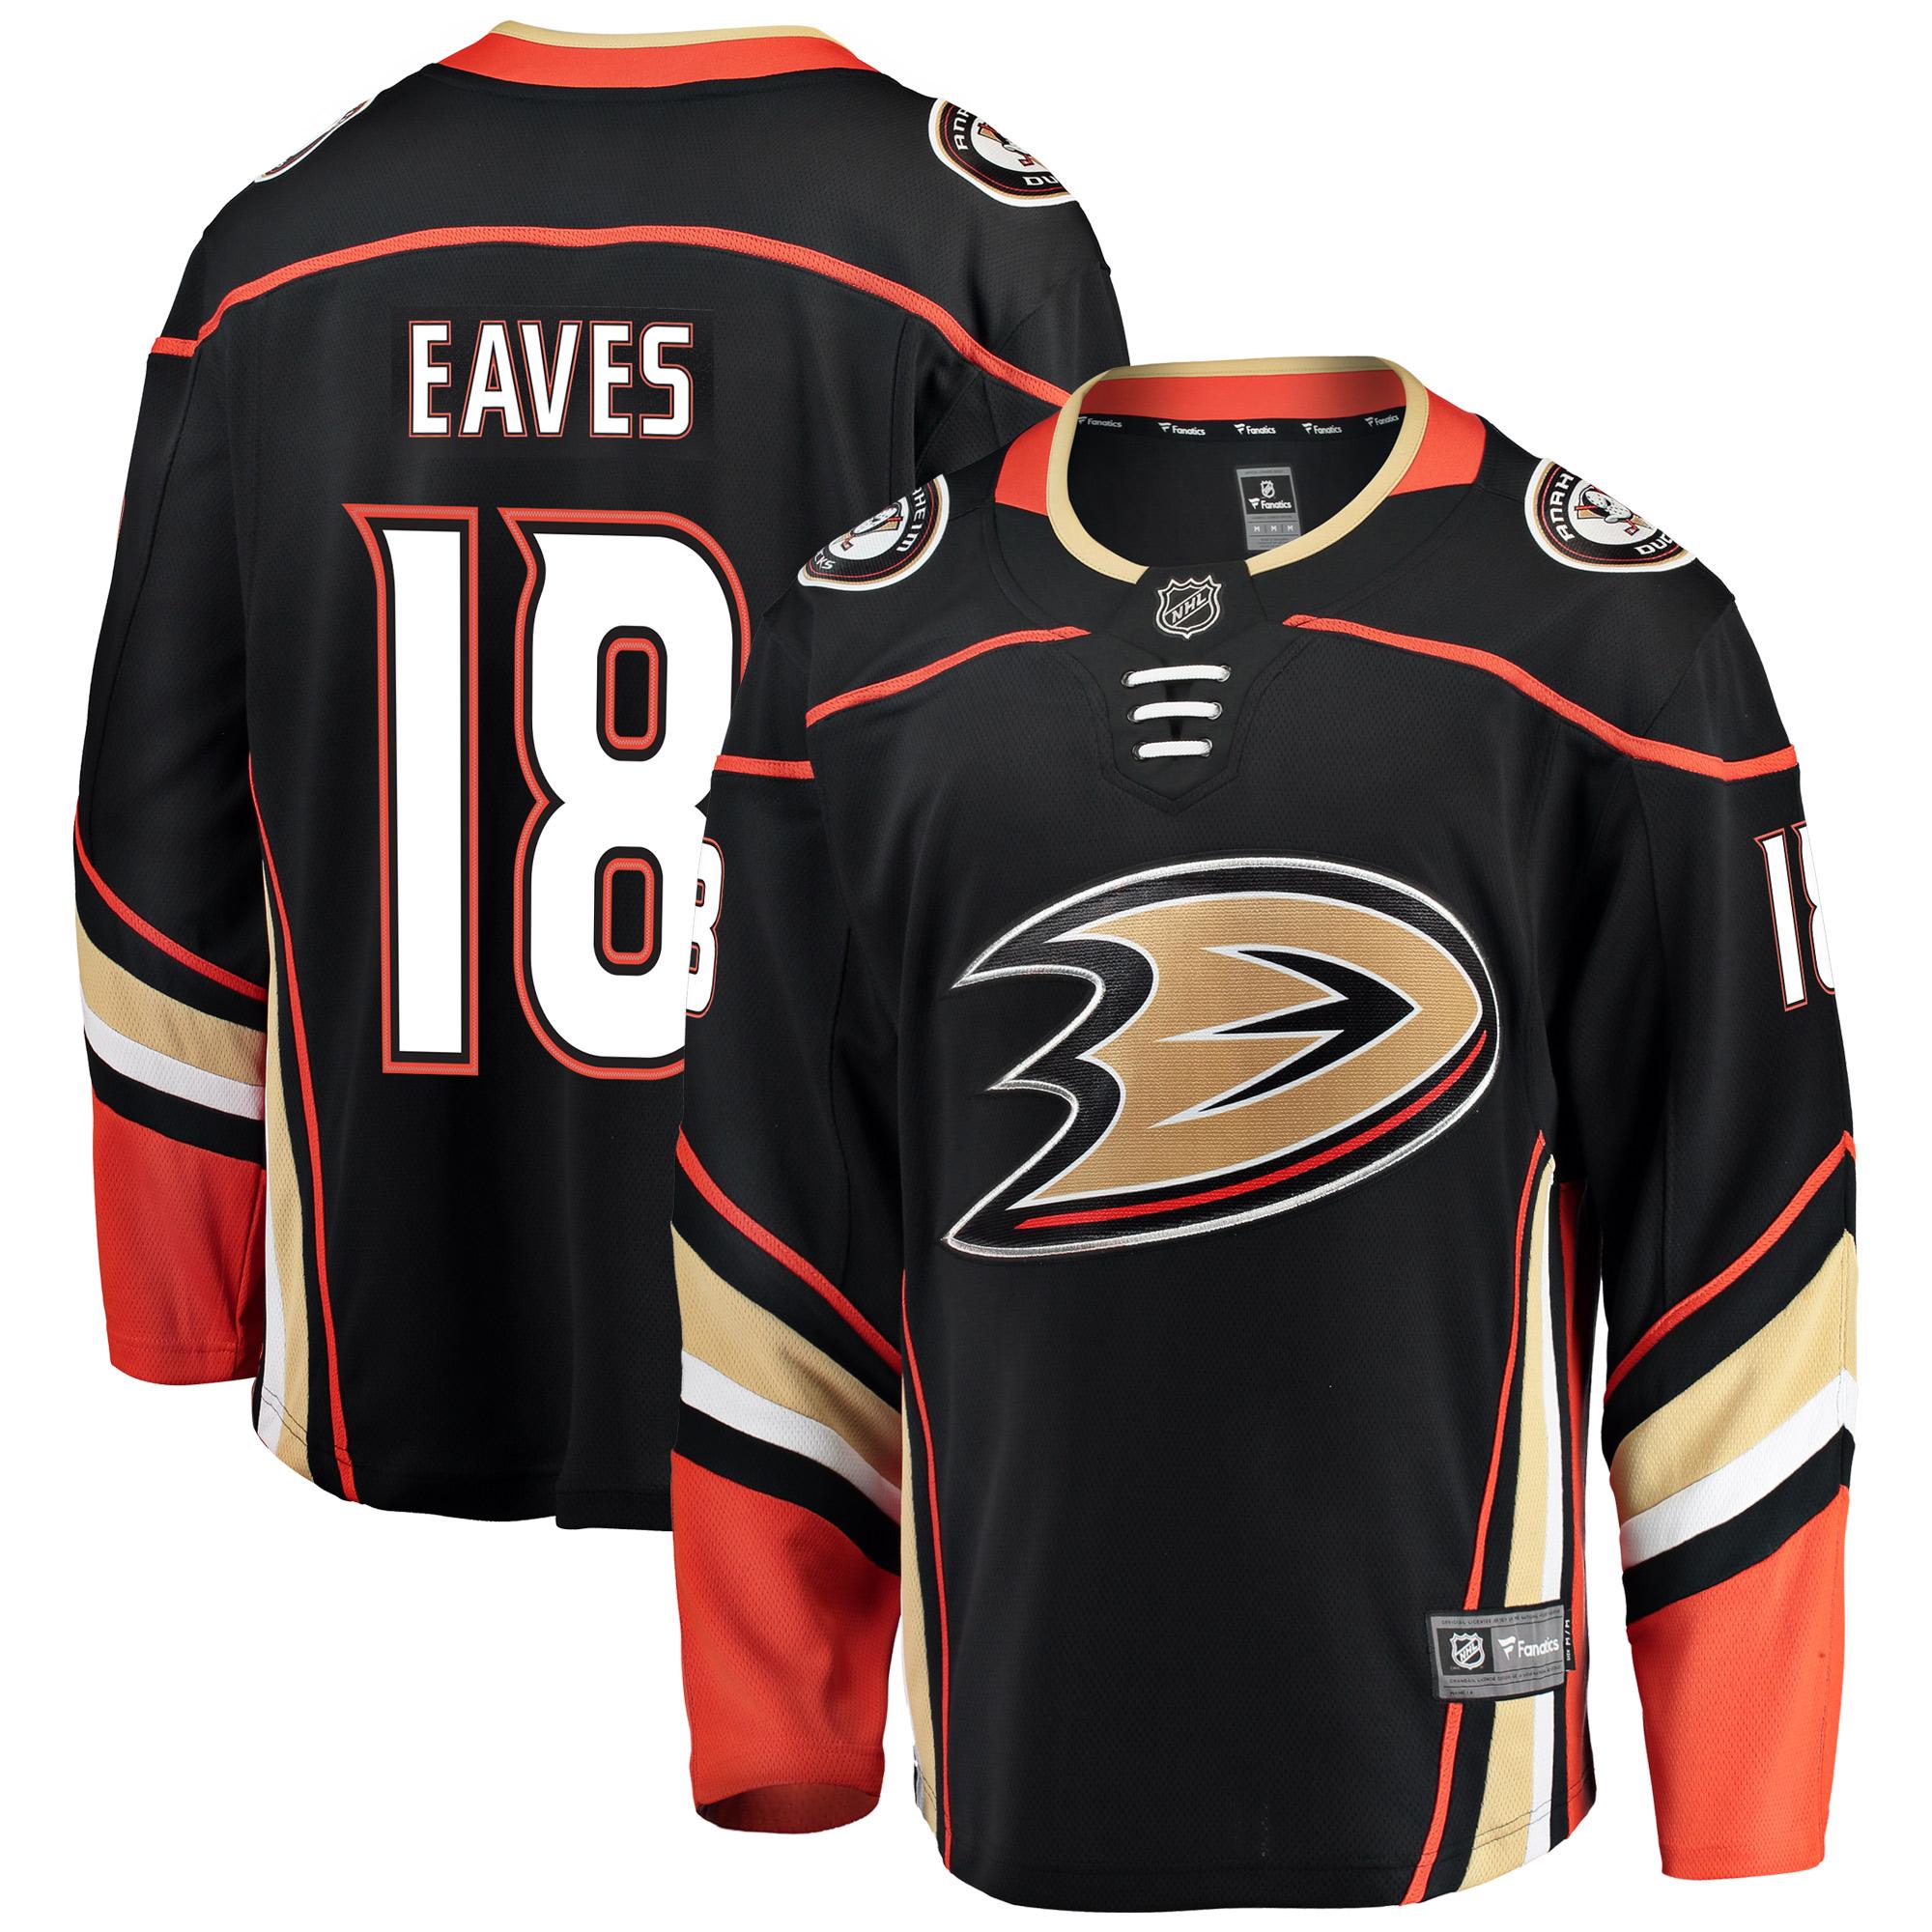 Patrick Eaves Anaheim Ducks Fanatics Branded Breakaway Player Jersey - Black